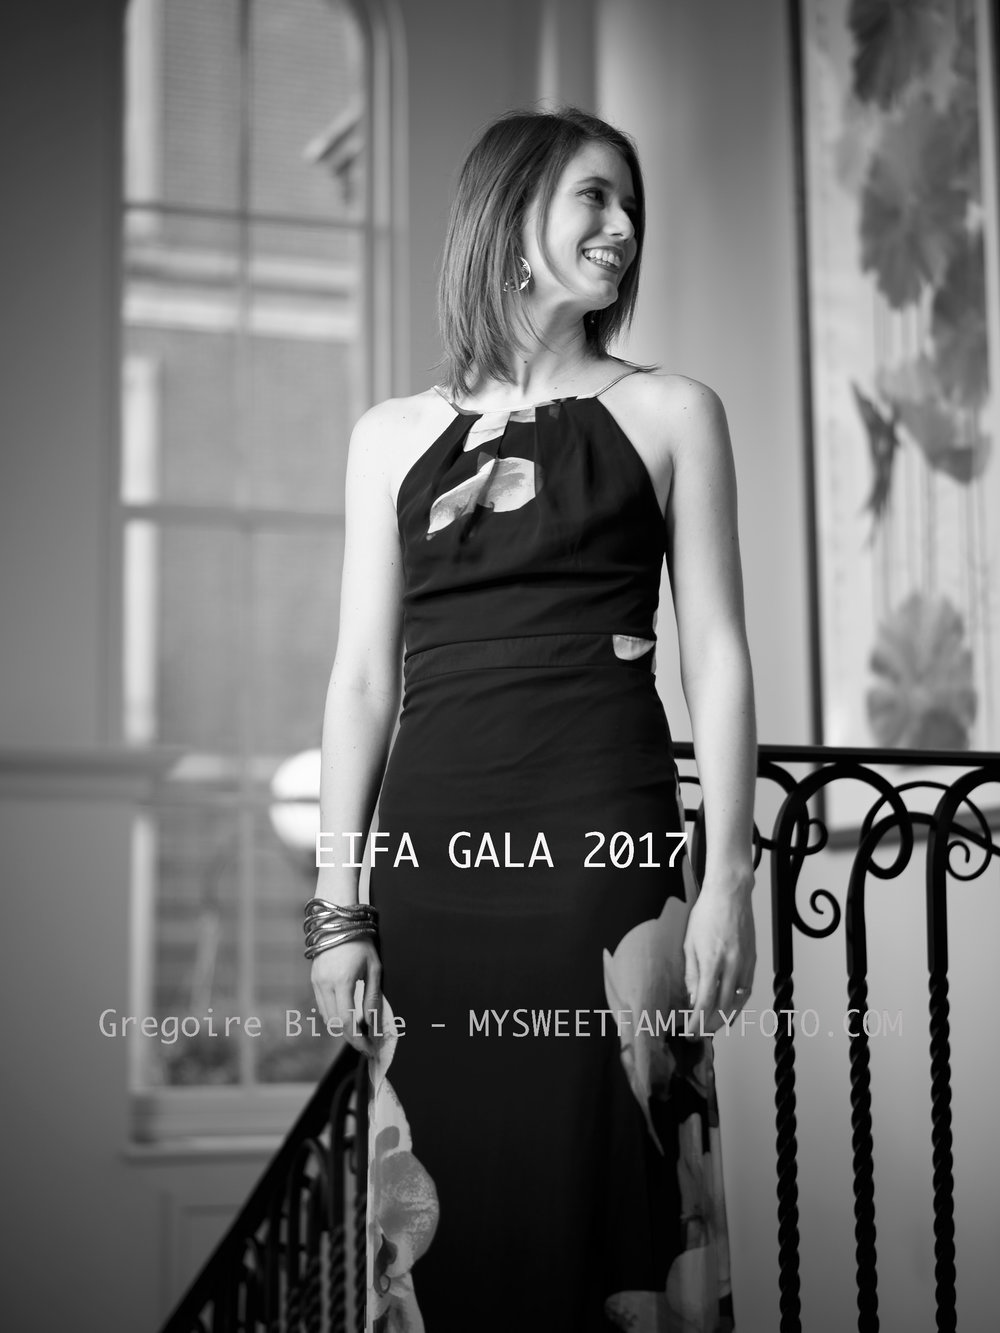 EIFA GALA 979.jpg